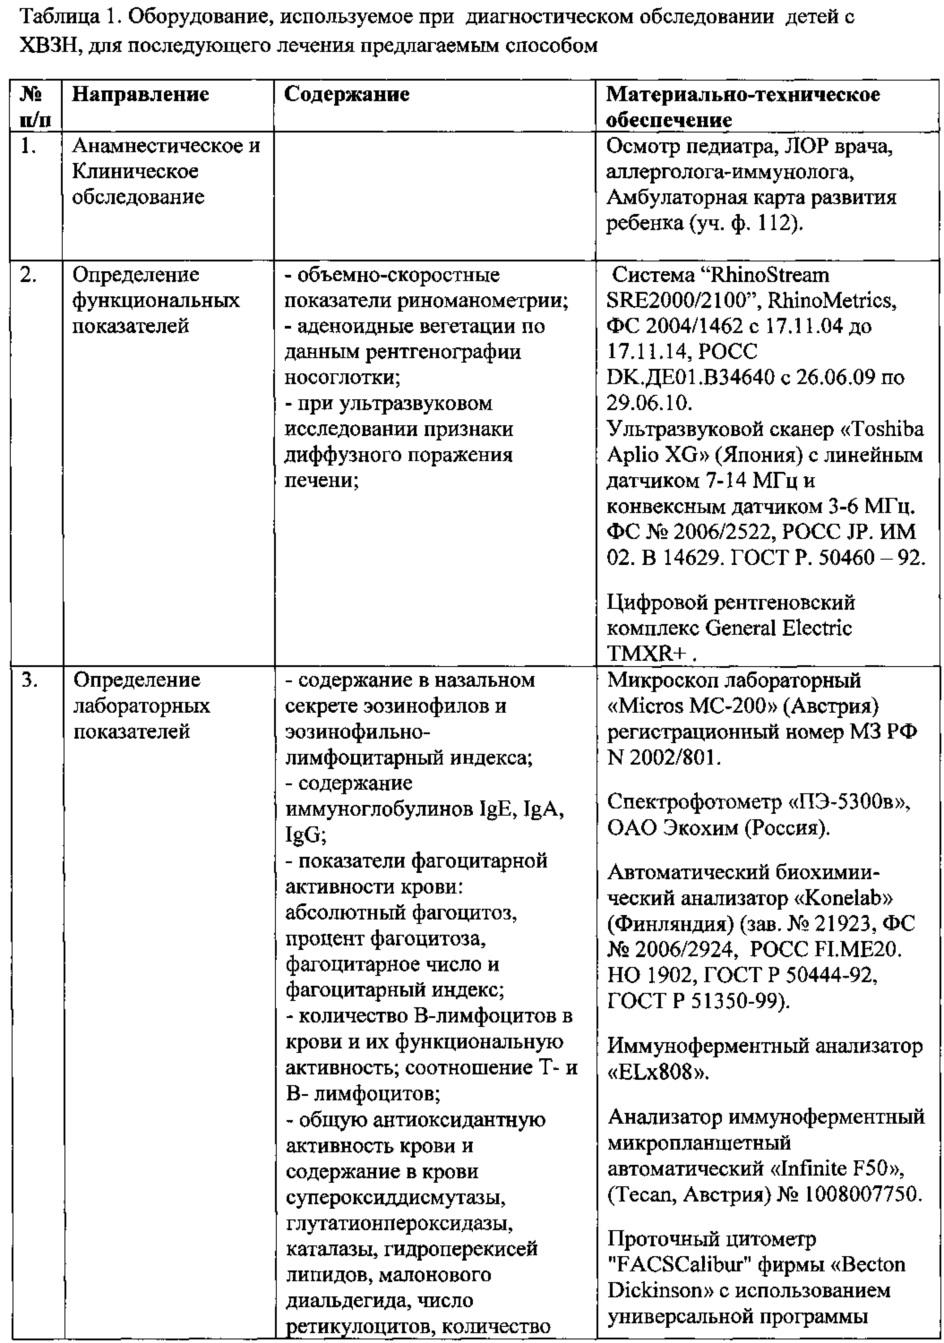 Medication Tonzilotren: reviews and applications